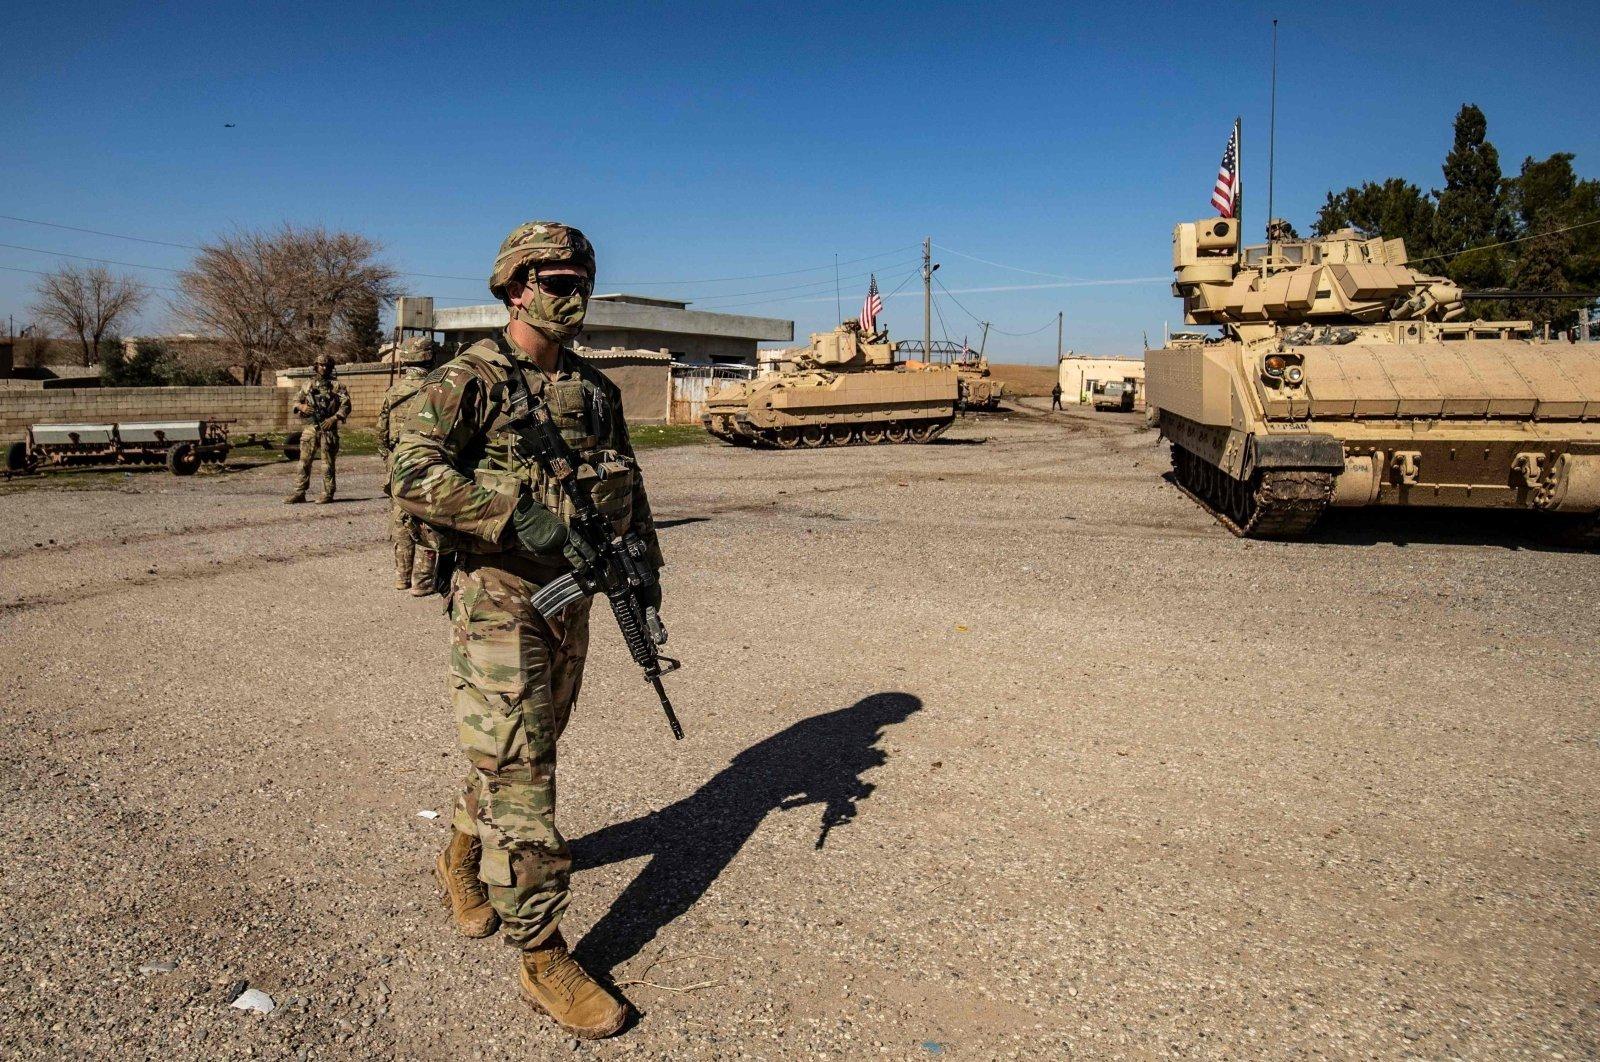 A U.S. soldier walks near a Bradley Fighting Vehicle (BFV) during a patrol in the countryside near al-Malikiyah (Derik) in Hassakeh province, Syria, Feb. 2, 2021. (AFP Photo)